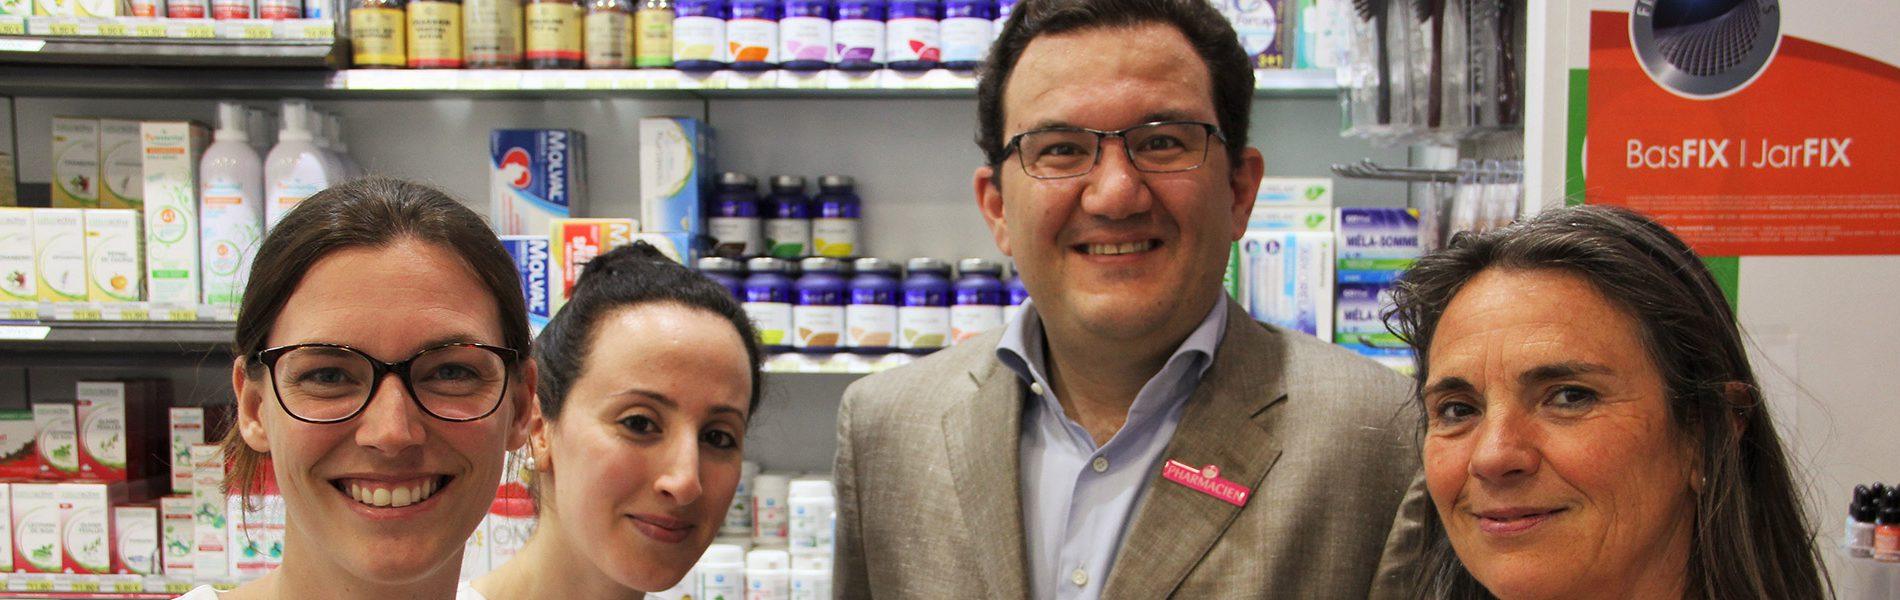 Pharmacie DU DOCTEUR BLANCHE - Image Homepage 3